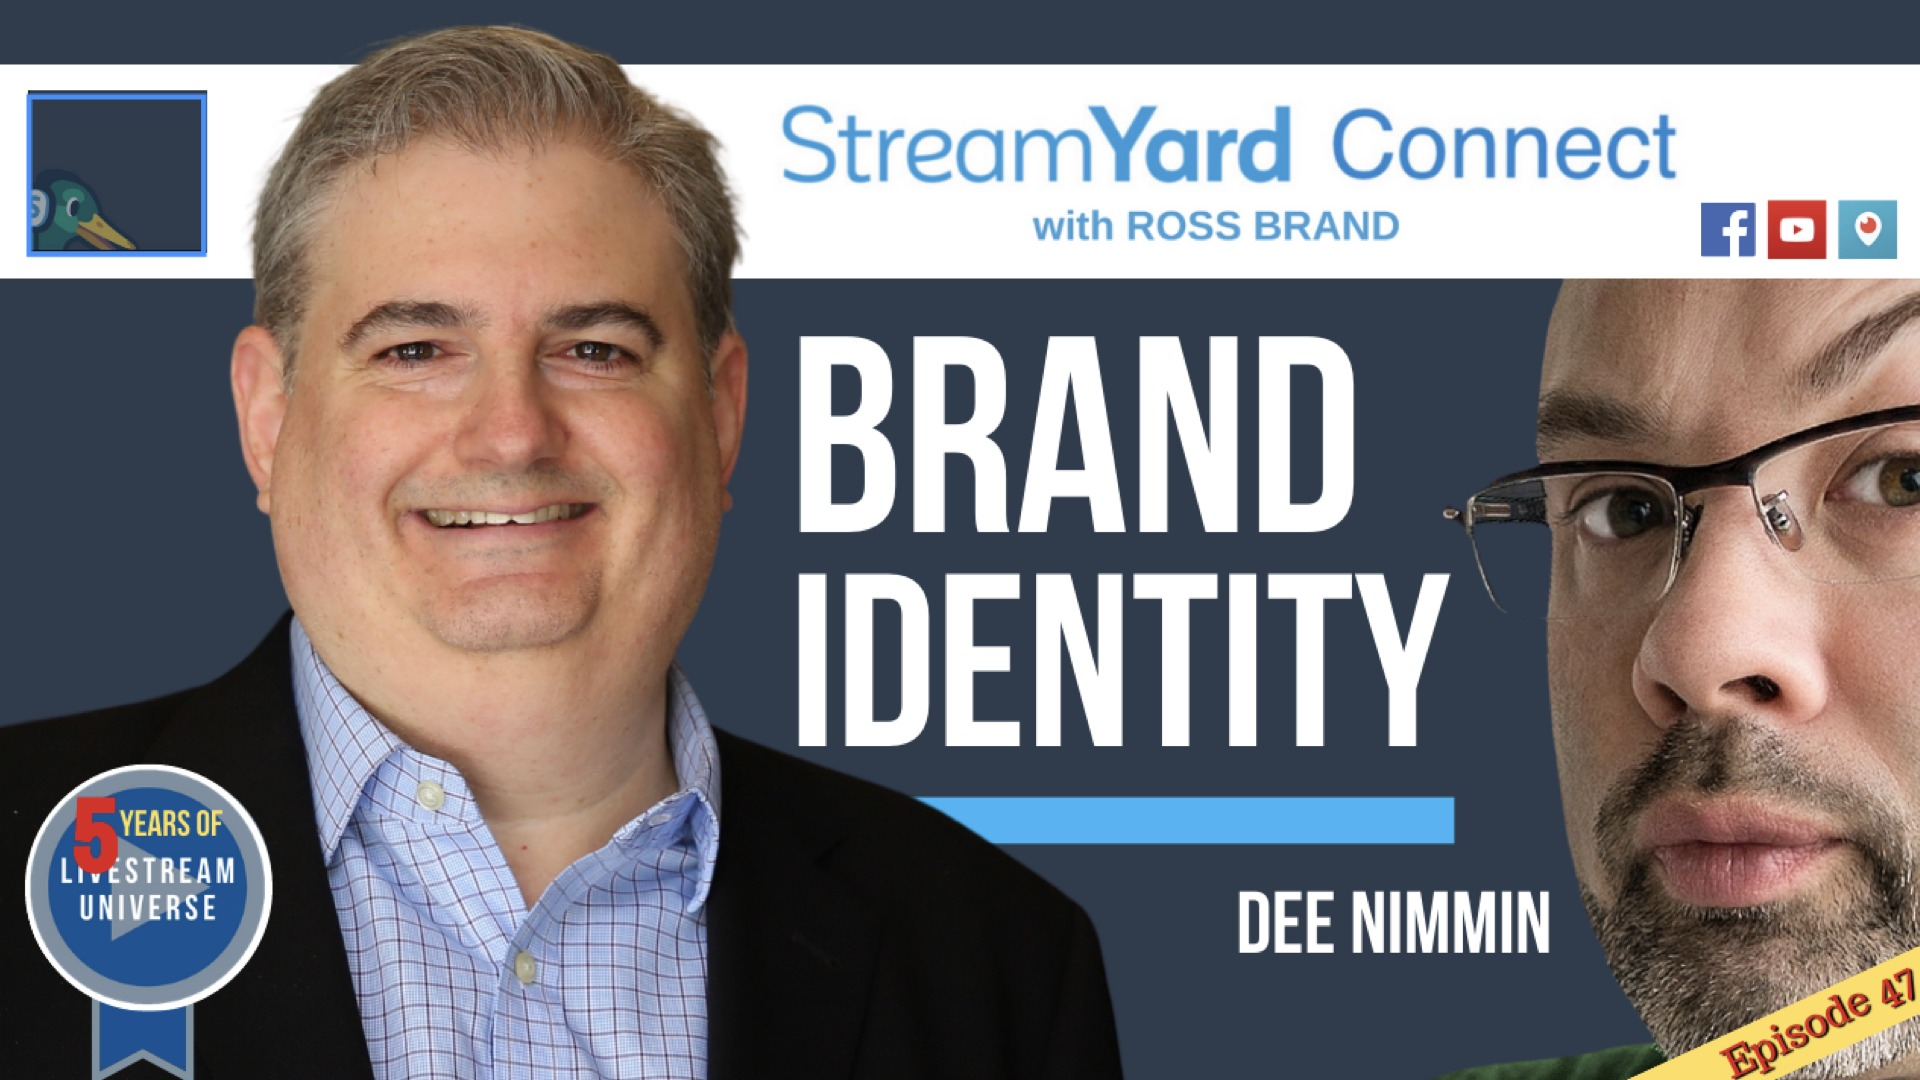 StreamYard Connect Ross Brand Dee Nimmin